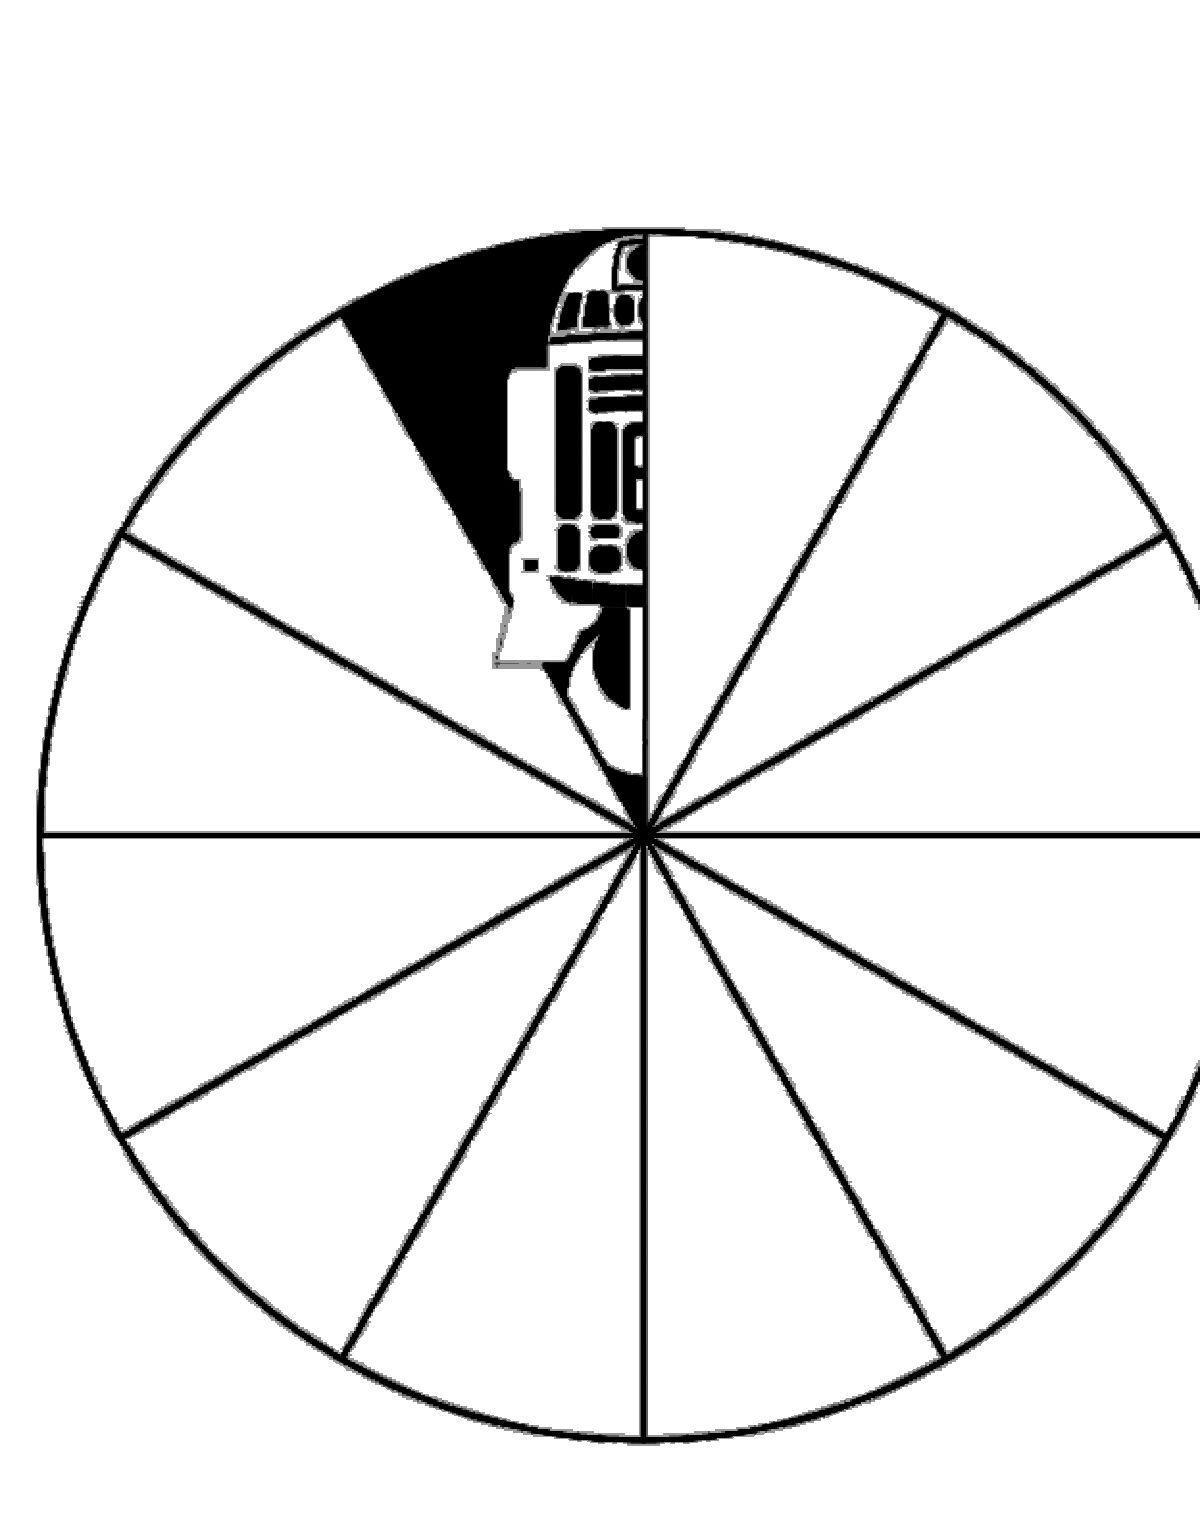 r2d2 snowflake template  Star Wars snowflake, R6D6 | Star wars snowflakes, Christmas ...